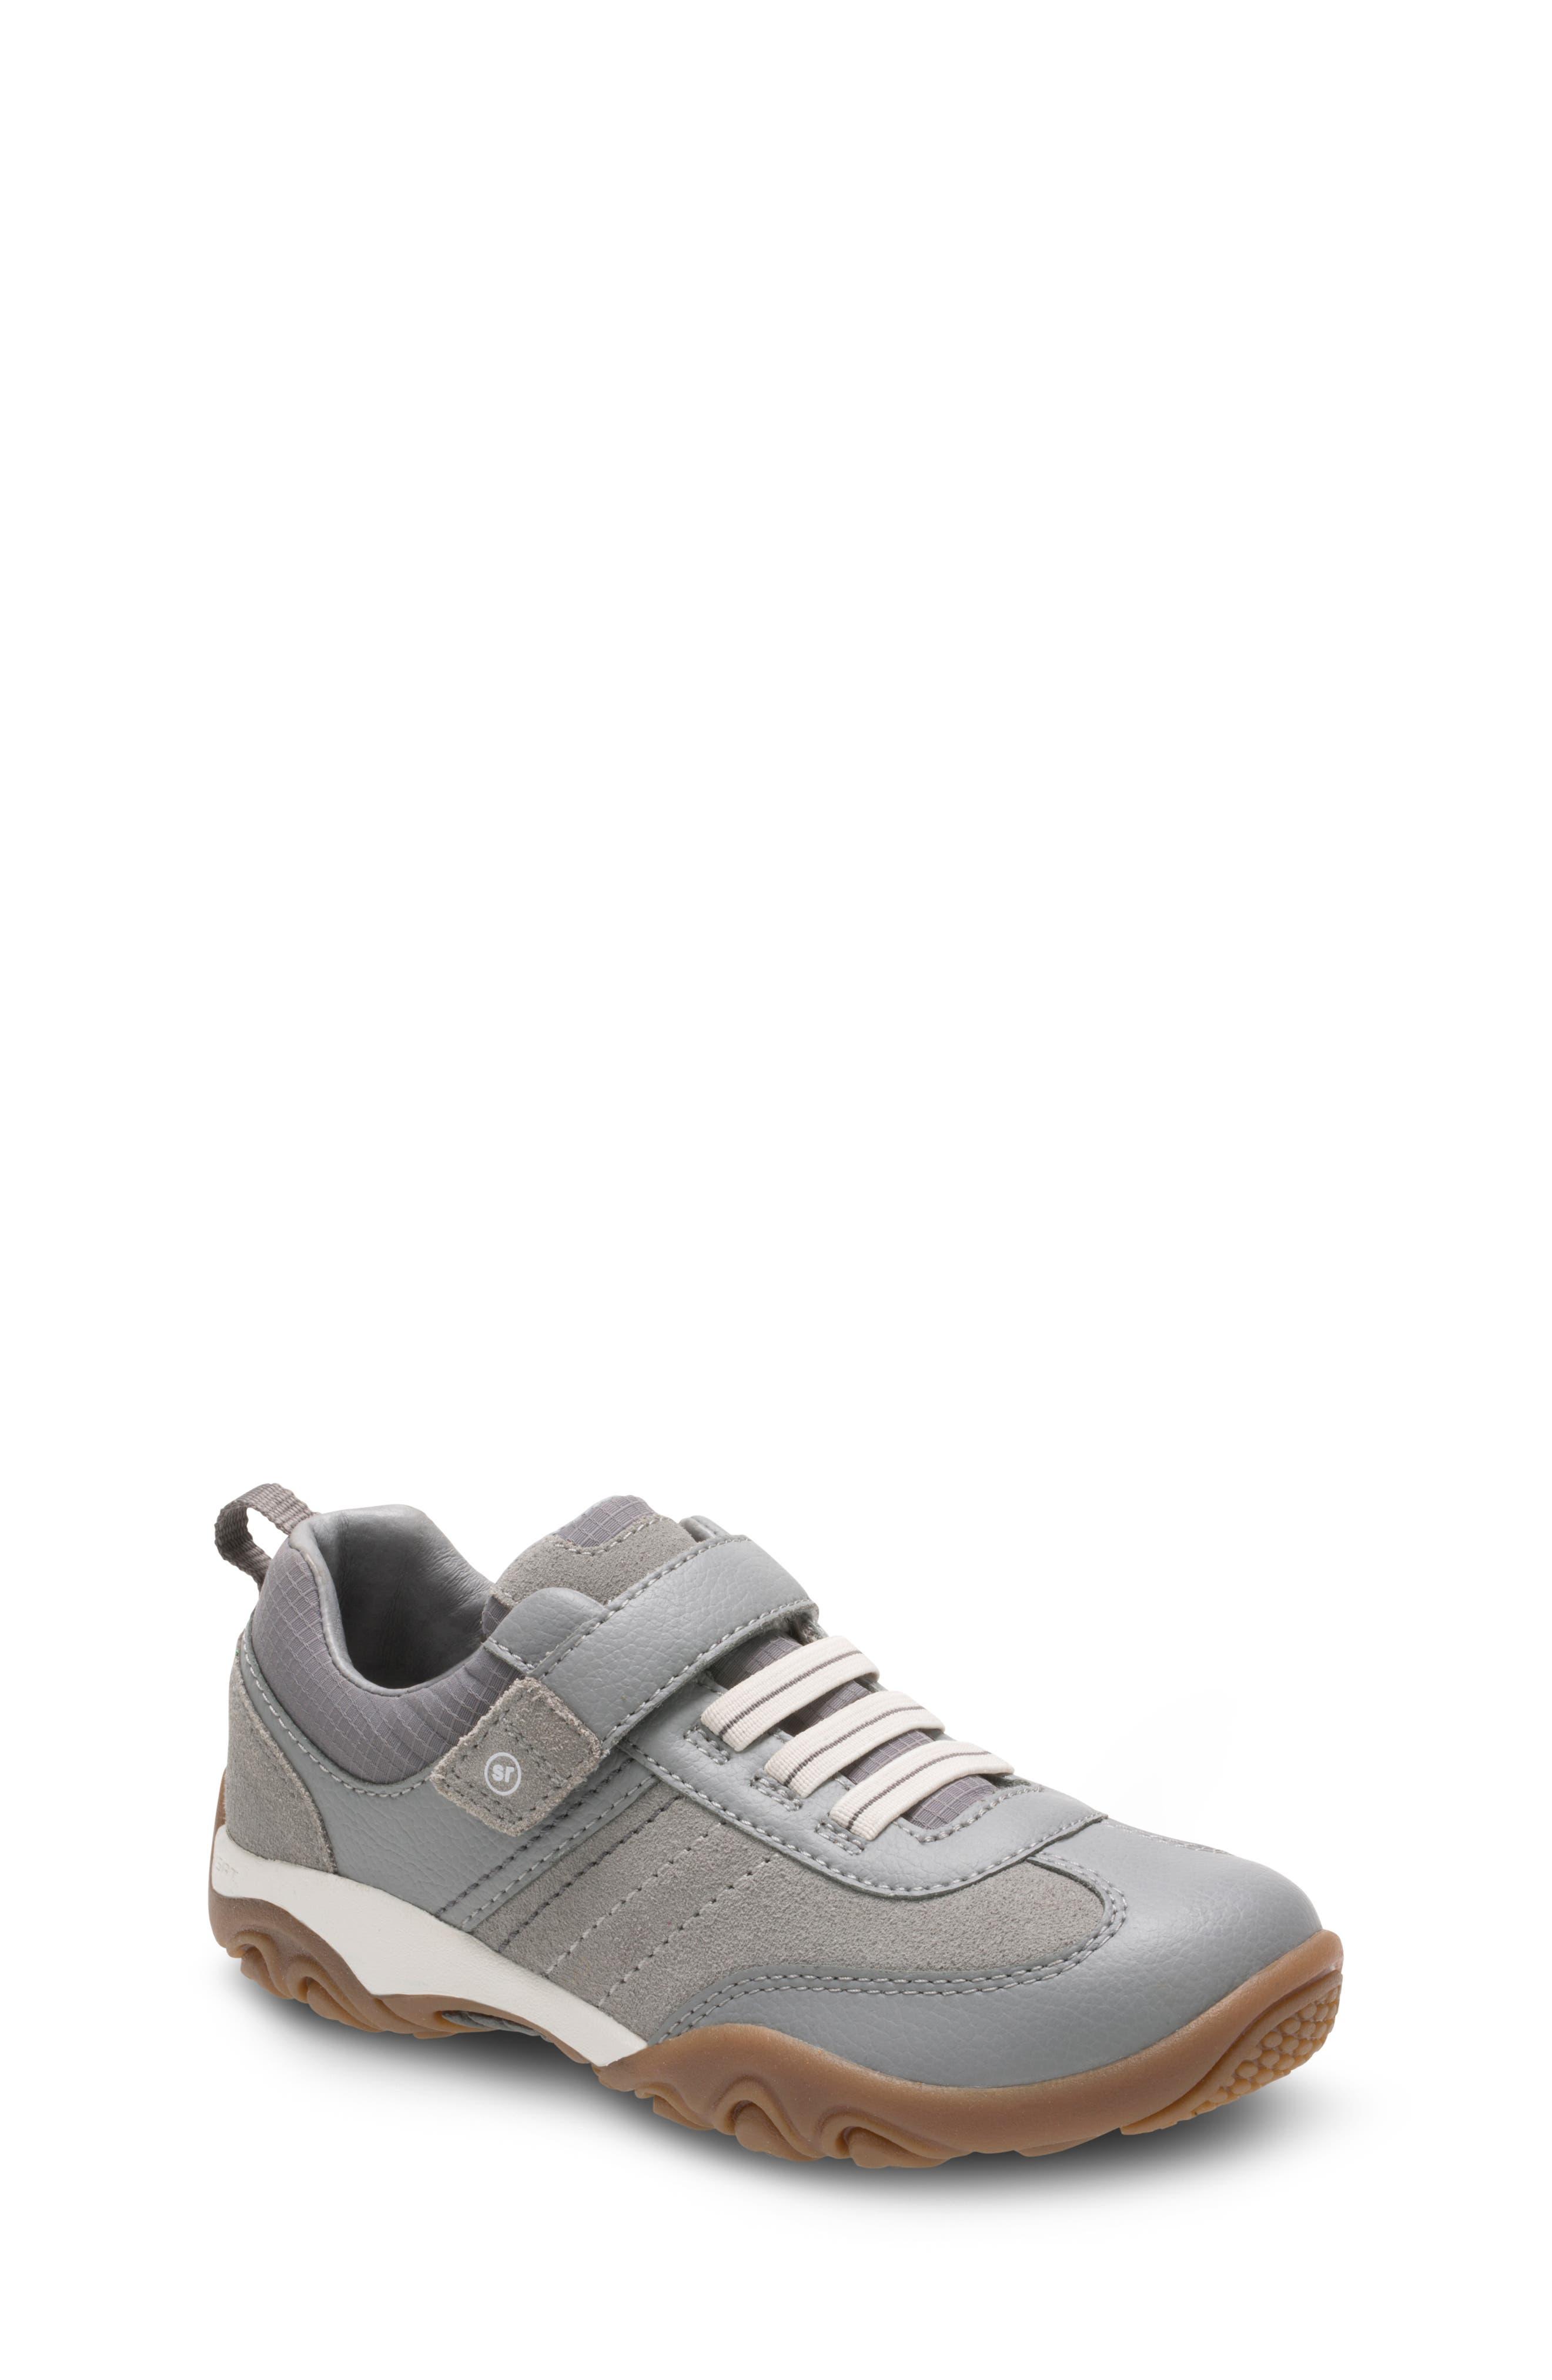 Prescott Sneaker,                             Main thumbnail 1, color,                             GREY